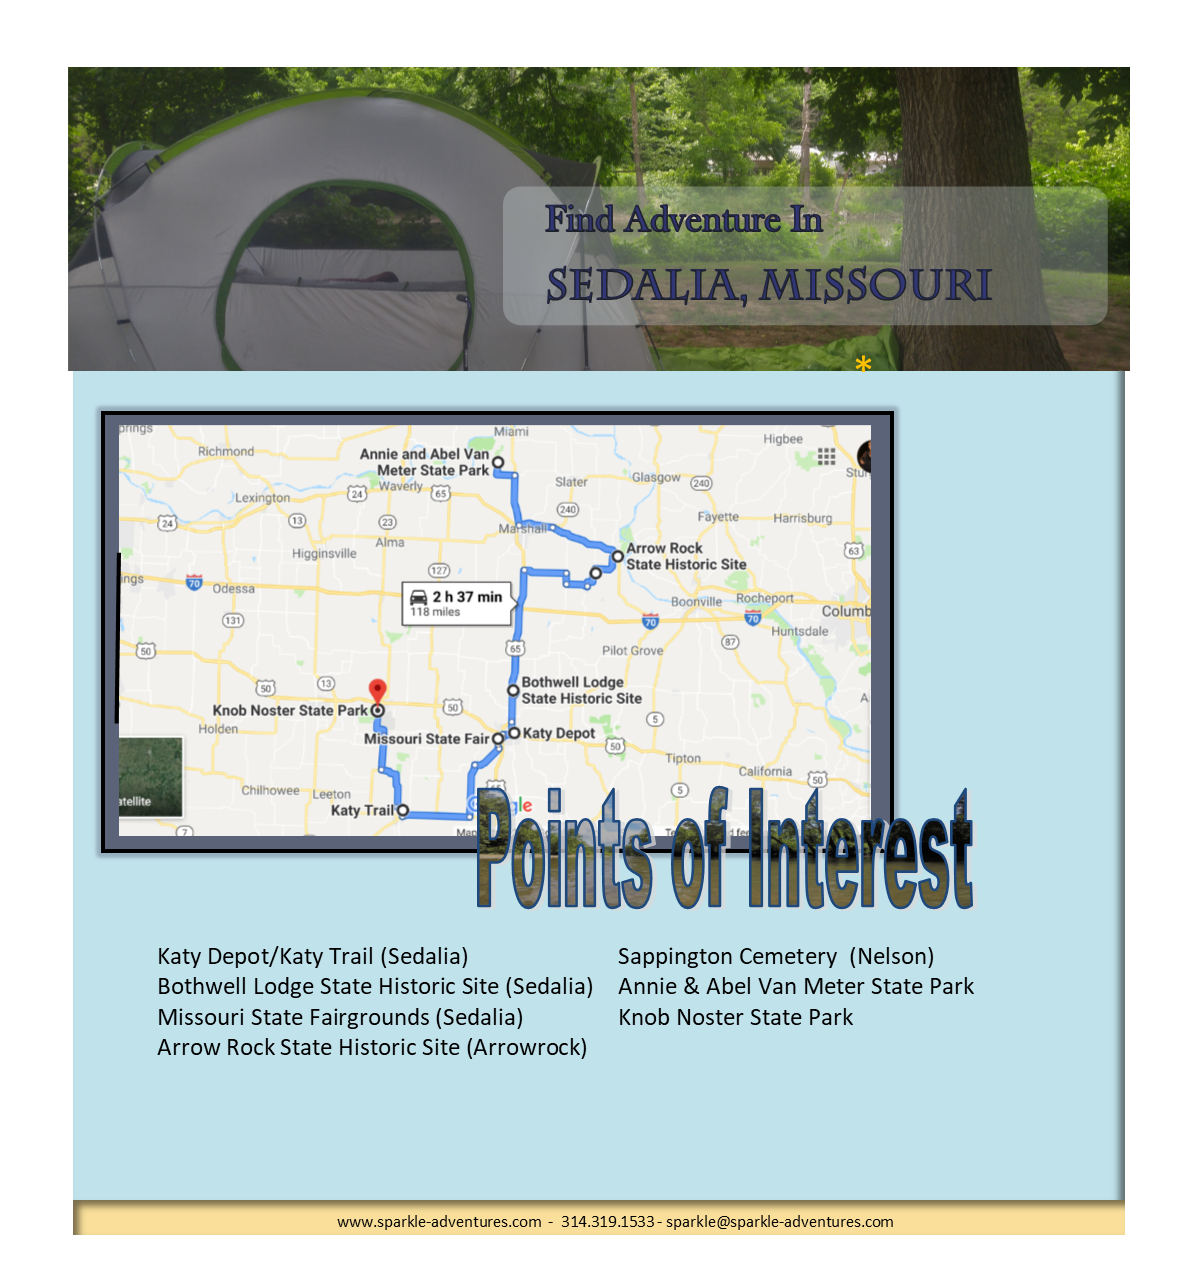 Find Adventure In Sedalia, Missouri